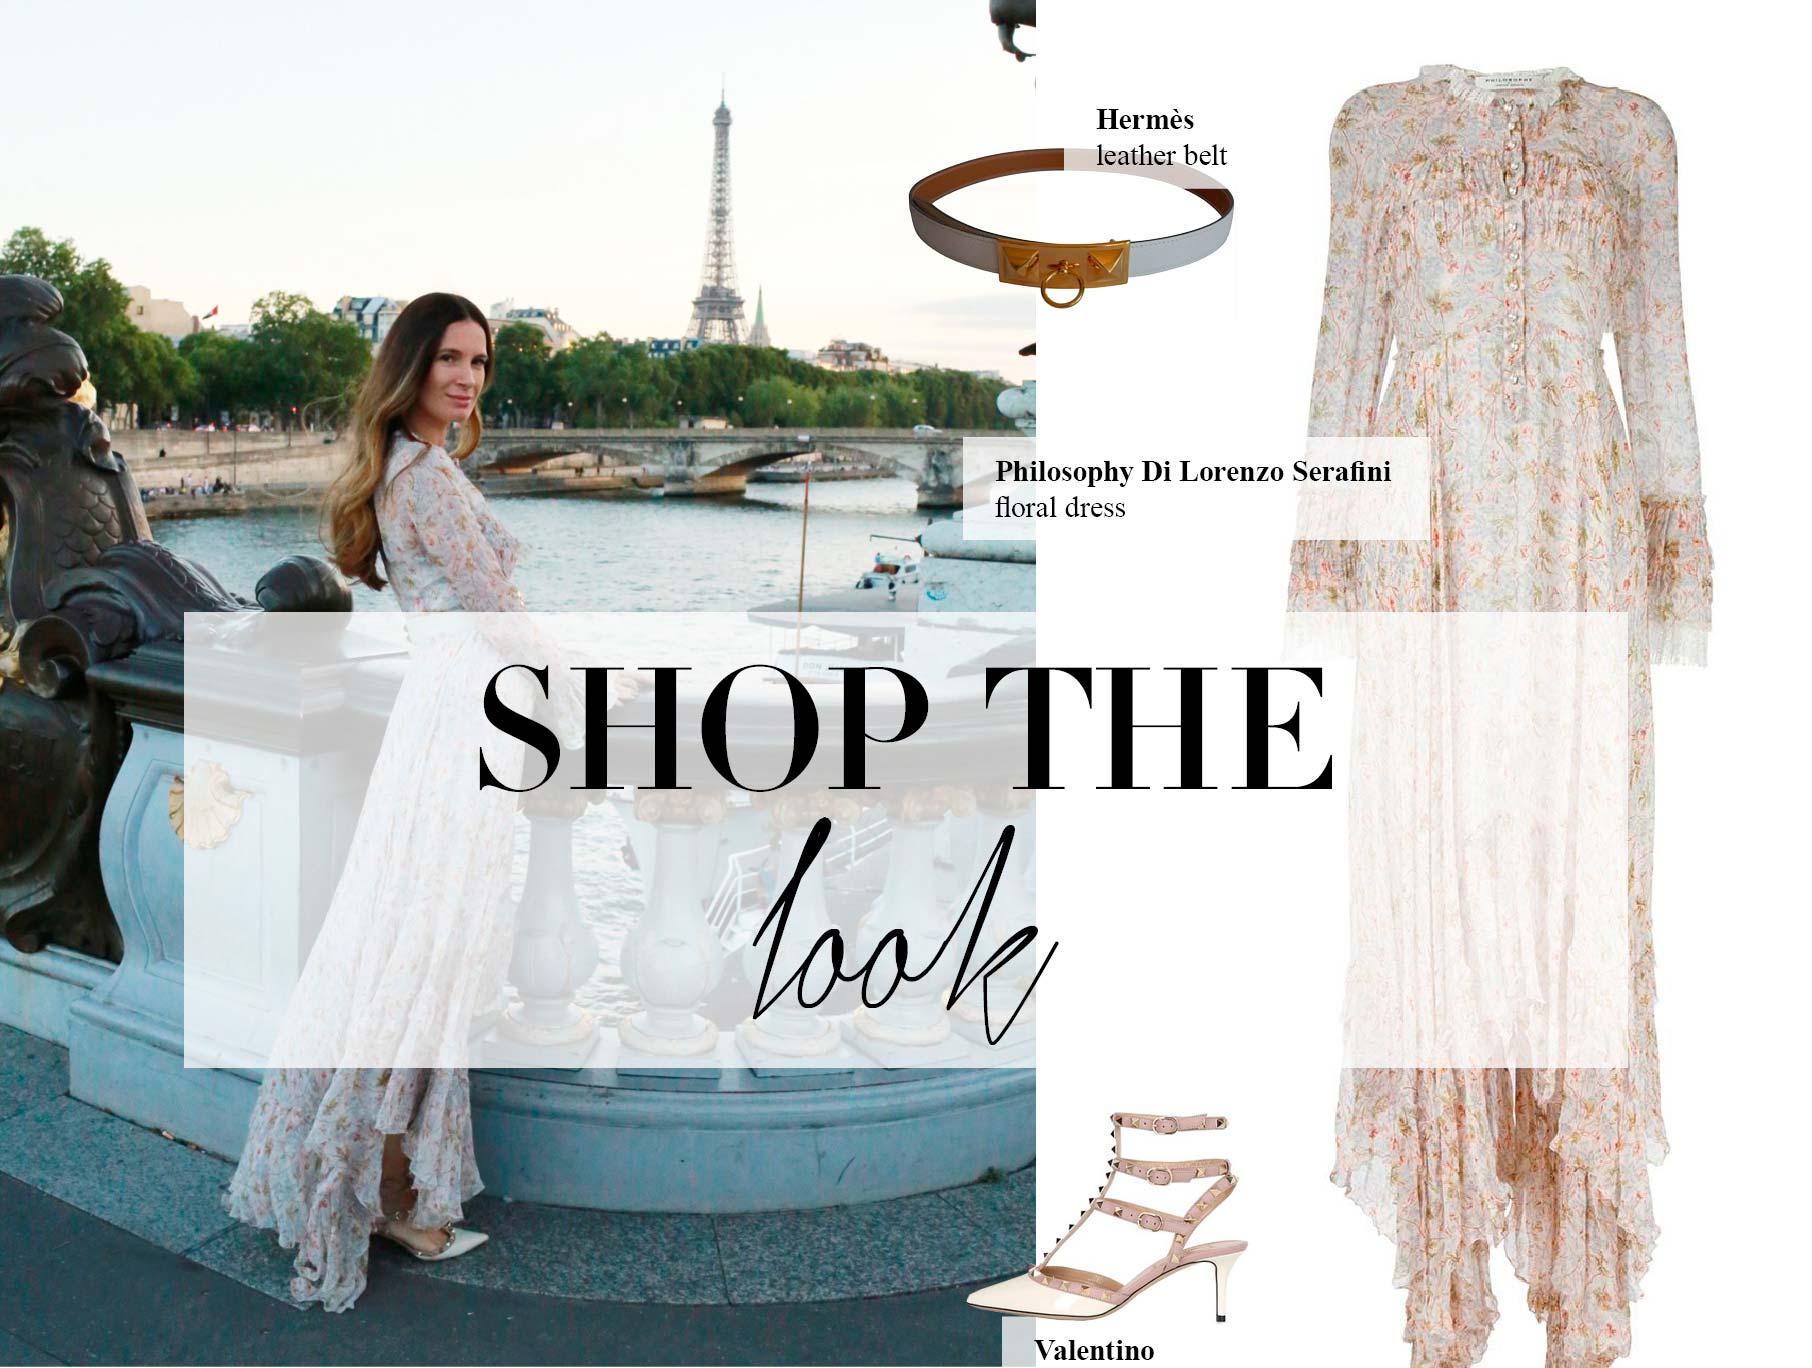 shop the look paris nights editorial lena terlutter. Black Bedroom Furniture Sets. Home Design Ideas